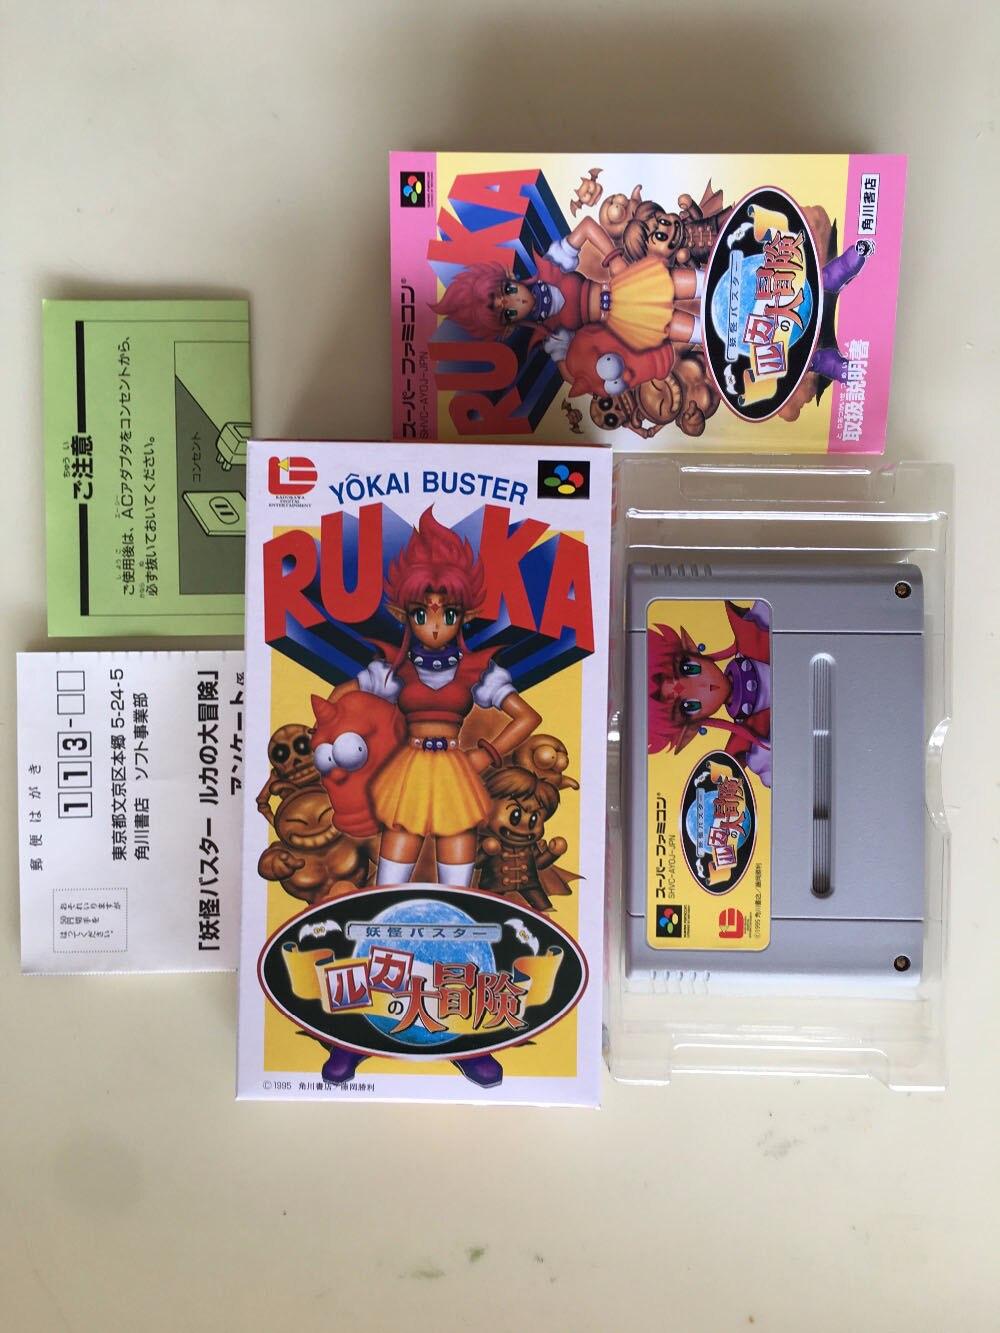 16bit jogos yok* yokai buster ruka (versão japão NTSC-J! Caixa + manual + cartucho!)